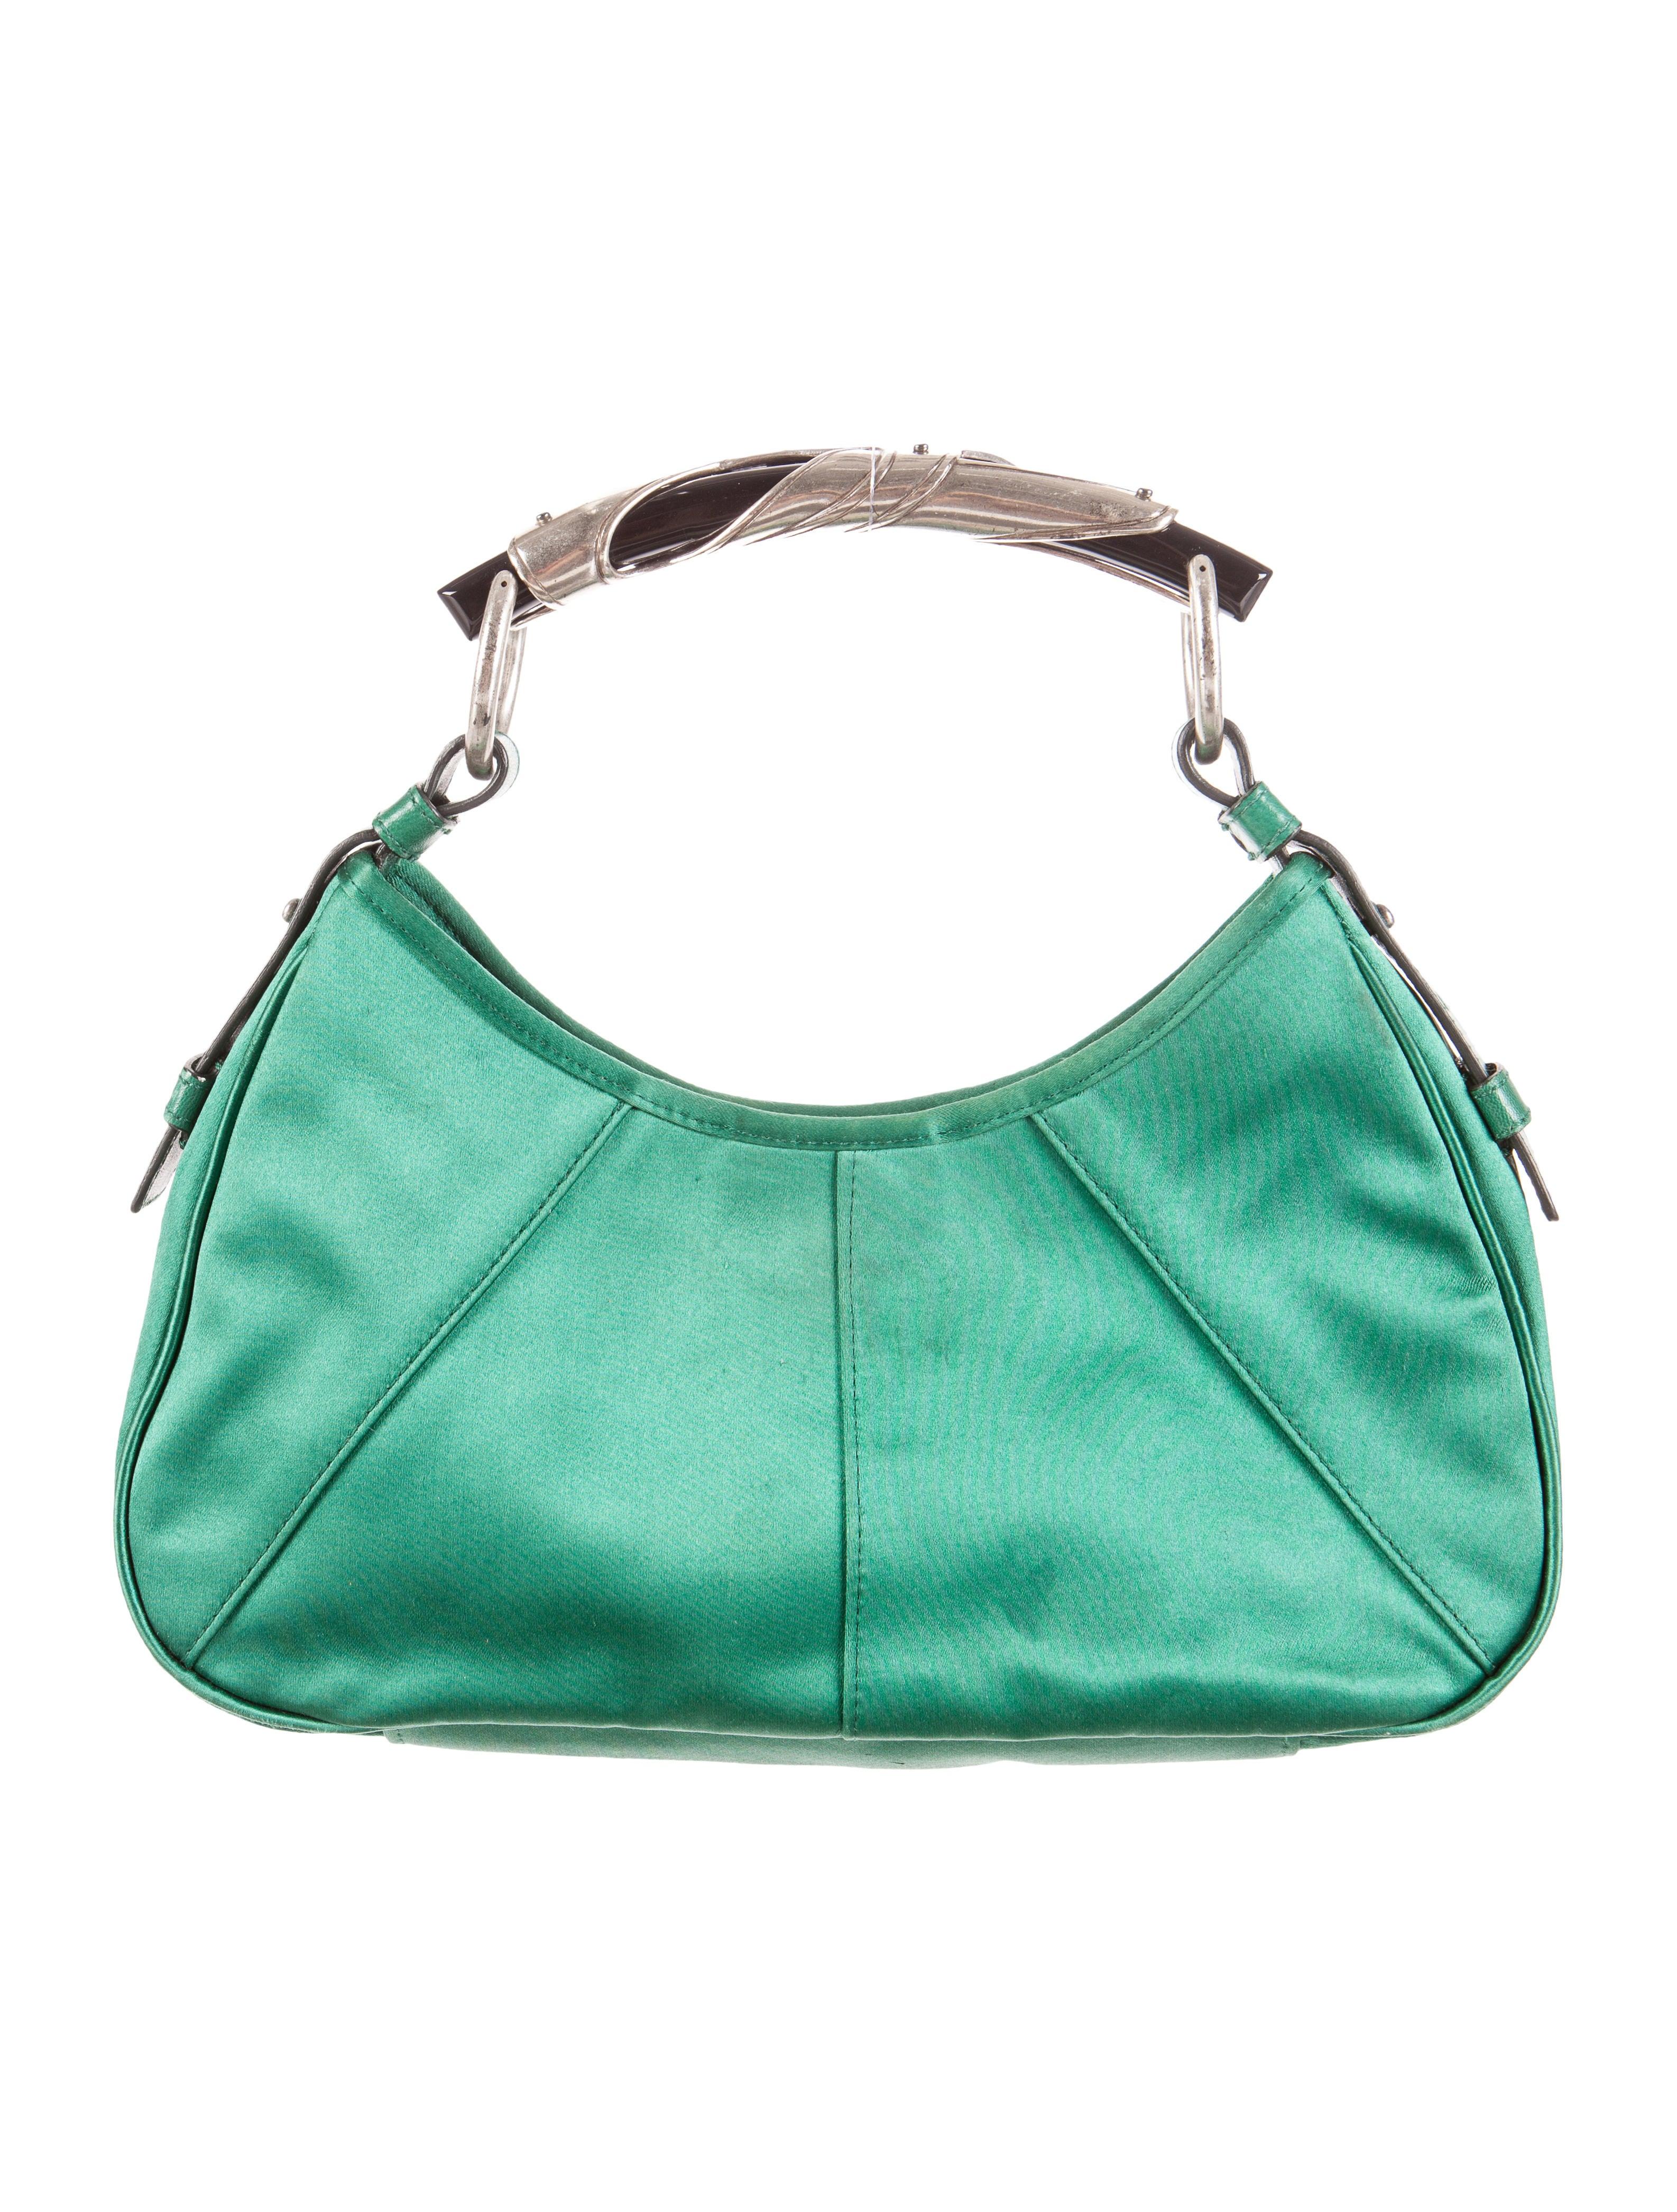 ysl monogram earrings - Yves Saint Laurent Mini Mombasa - Handbags - YVE37072 | The RealReal